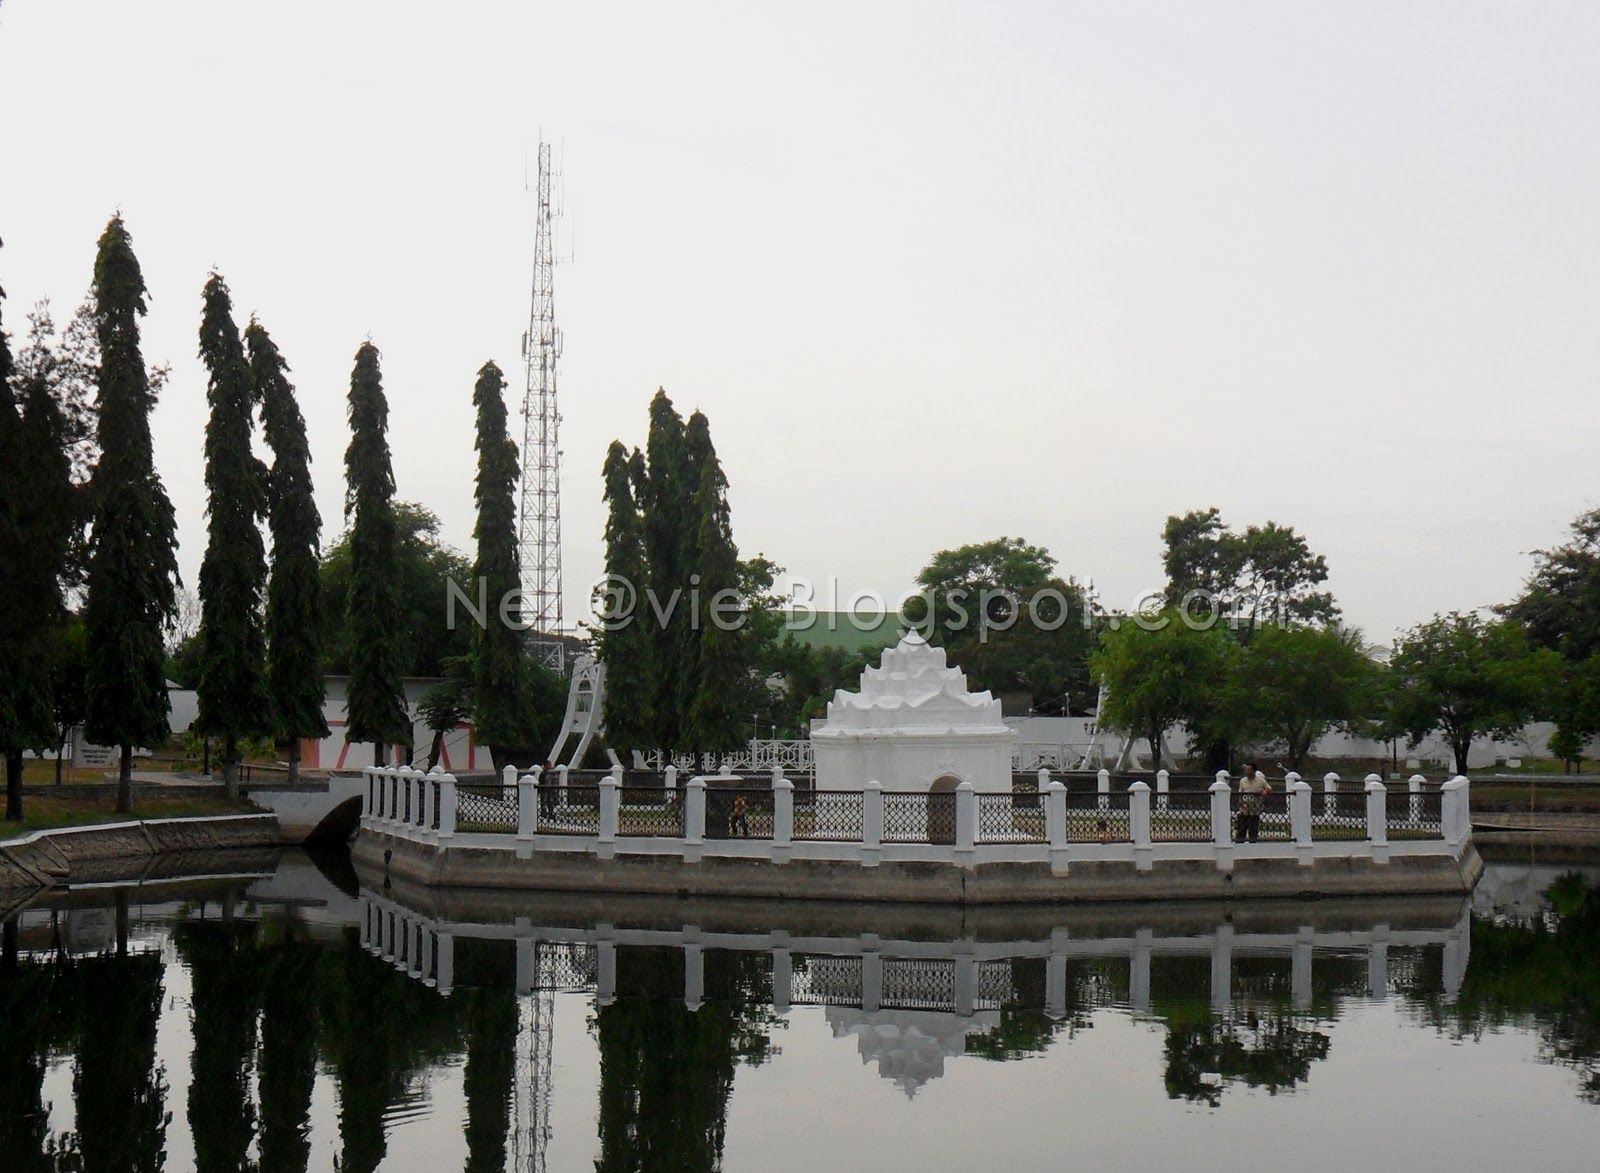 Nel Vie Online Cerita Puteri Pahang Objek Wisata Taman Putroe